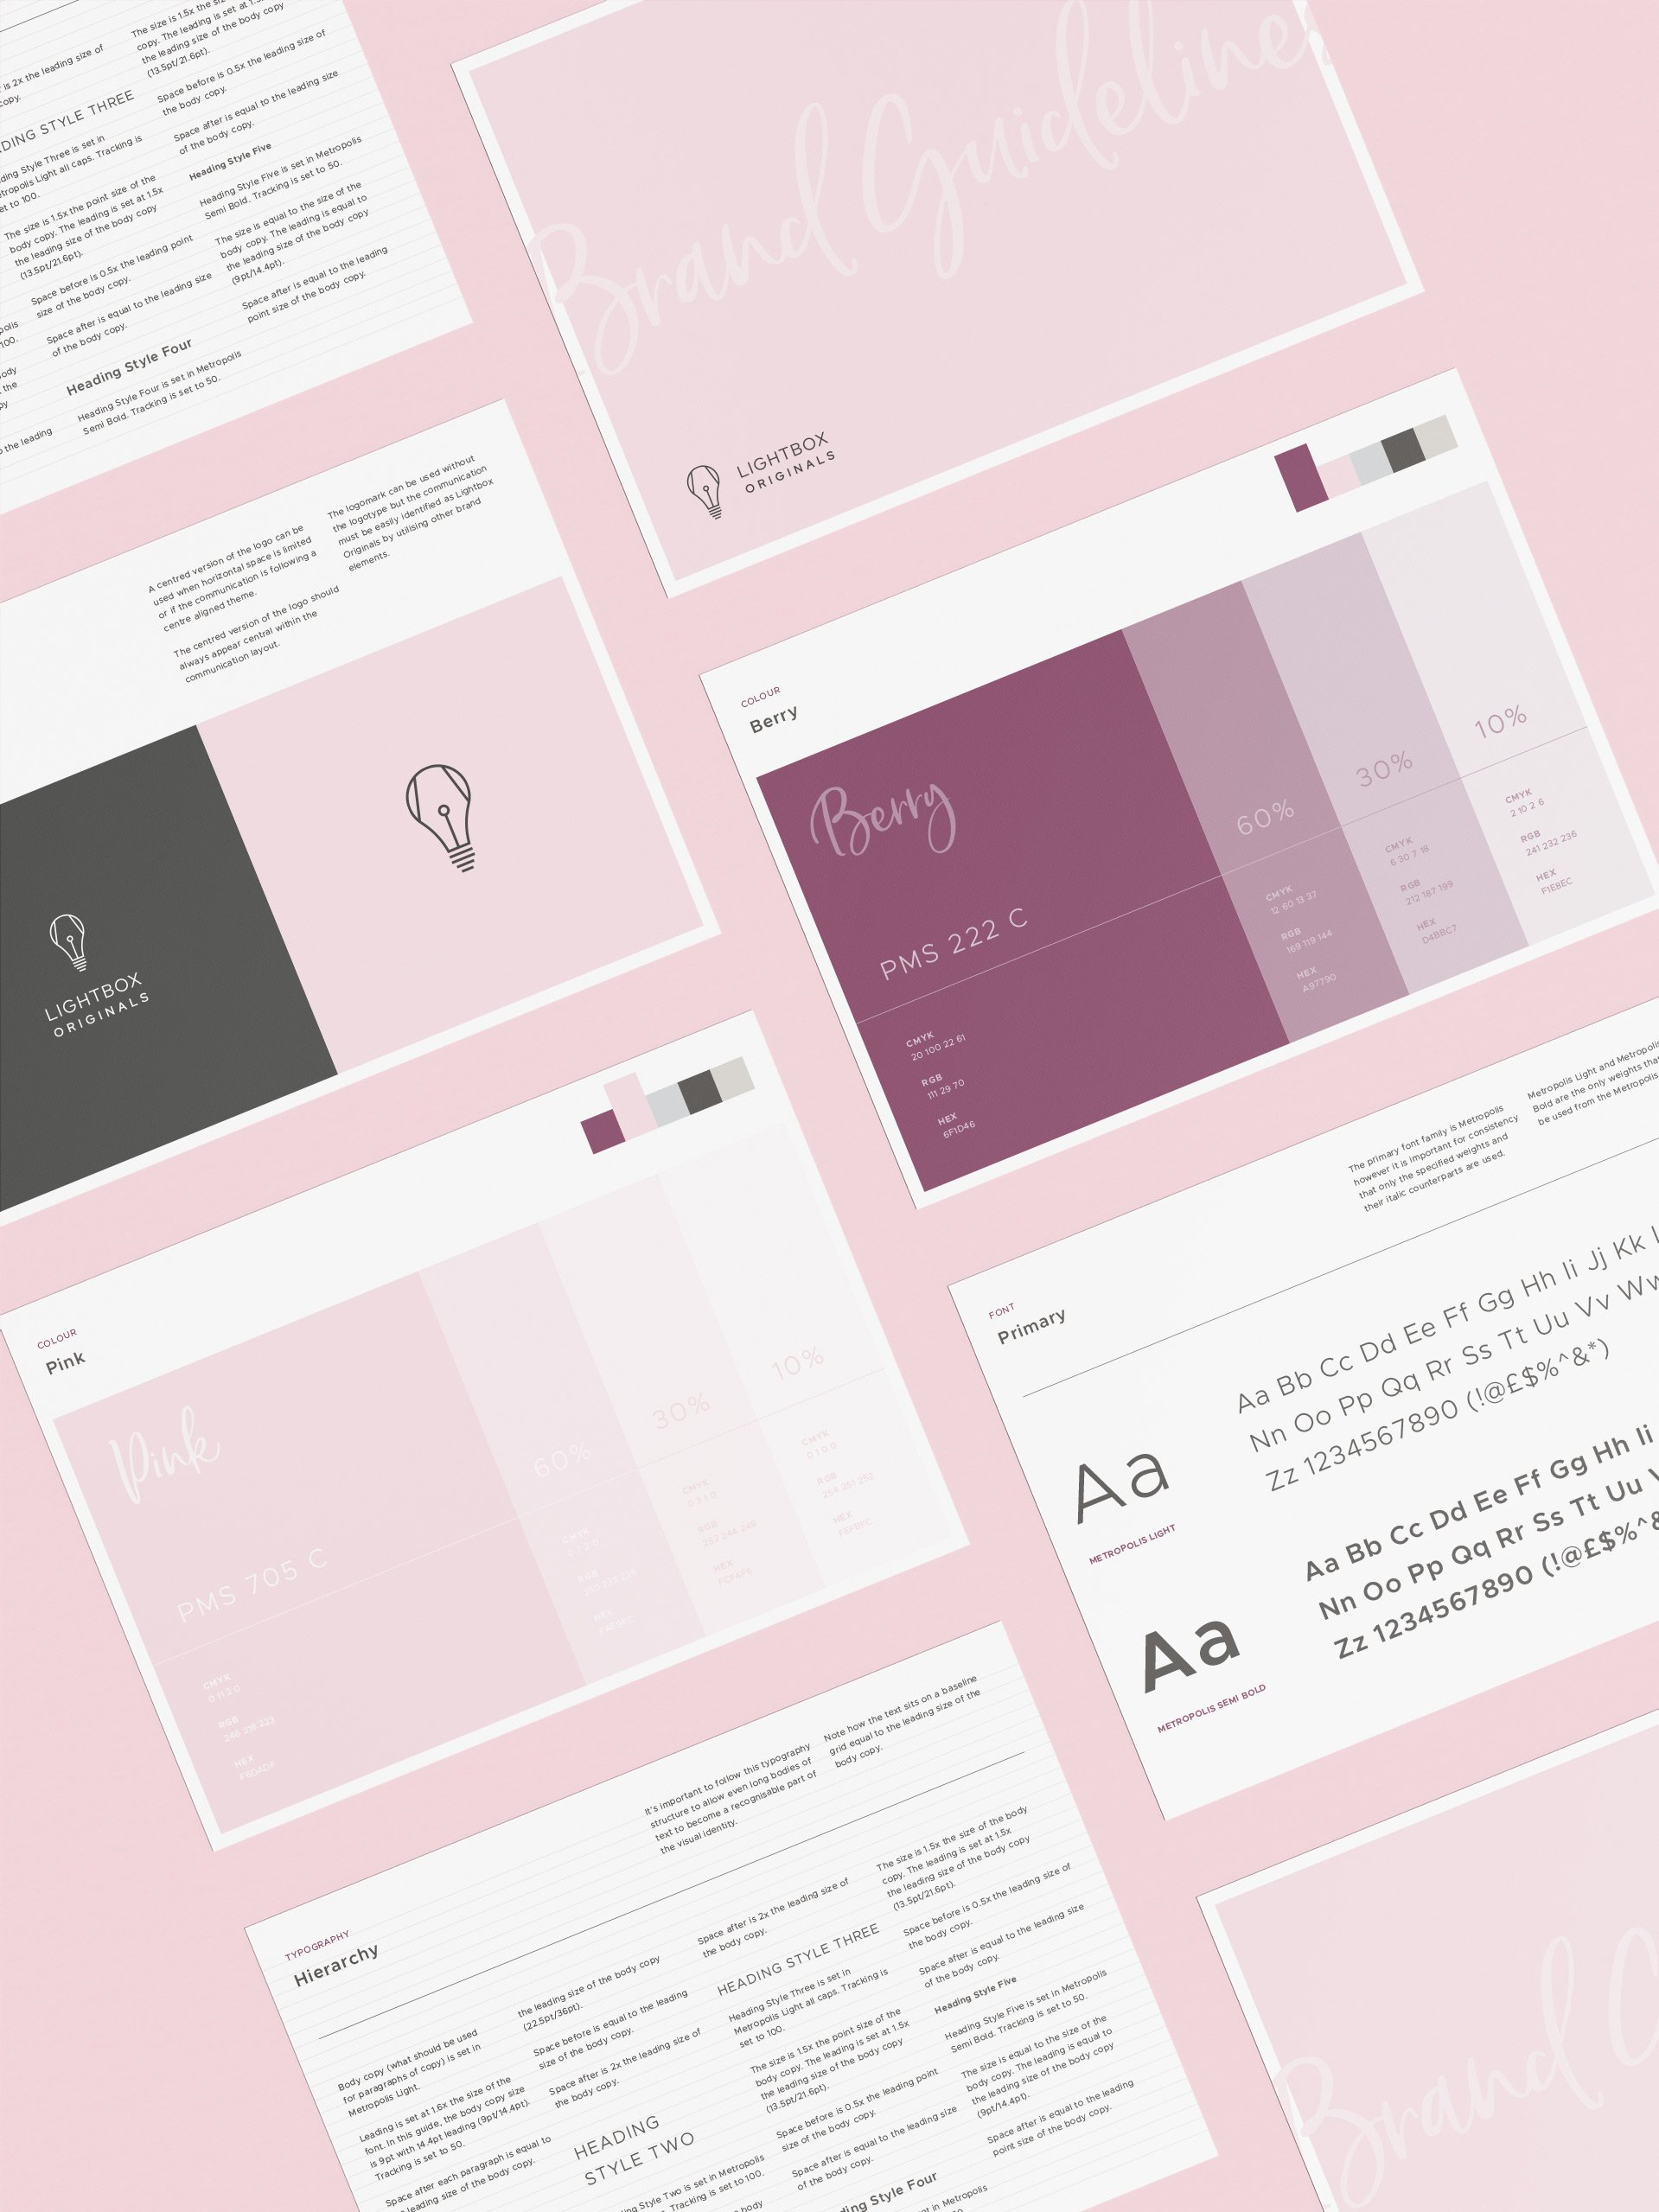 Lightbox Originals Brand Style Guide